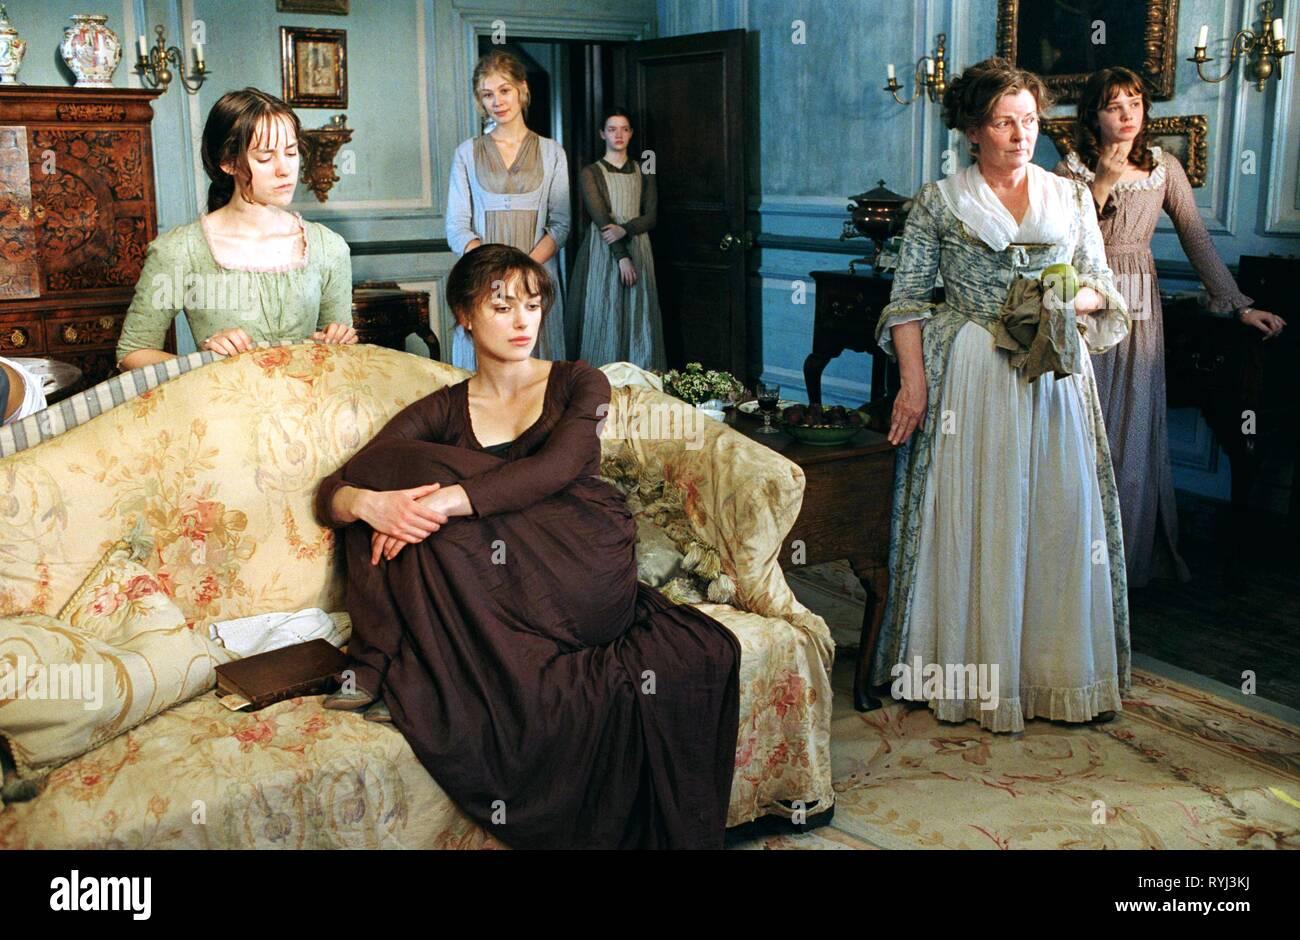 JENA MALONE, KEIRA KNIGHTLEY, ROSAMUND PIKE, TALULAH RILEY, BRENDA BLETHYN, CAREY MULLIGAN, PRIDE and PREJUDICE, 2005 - Stock Image